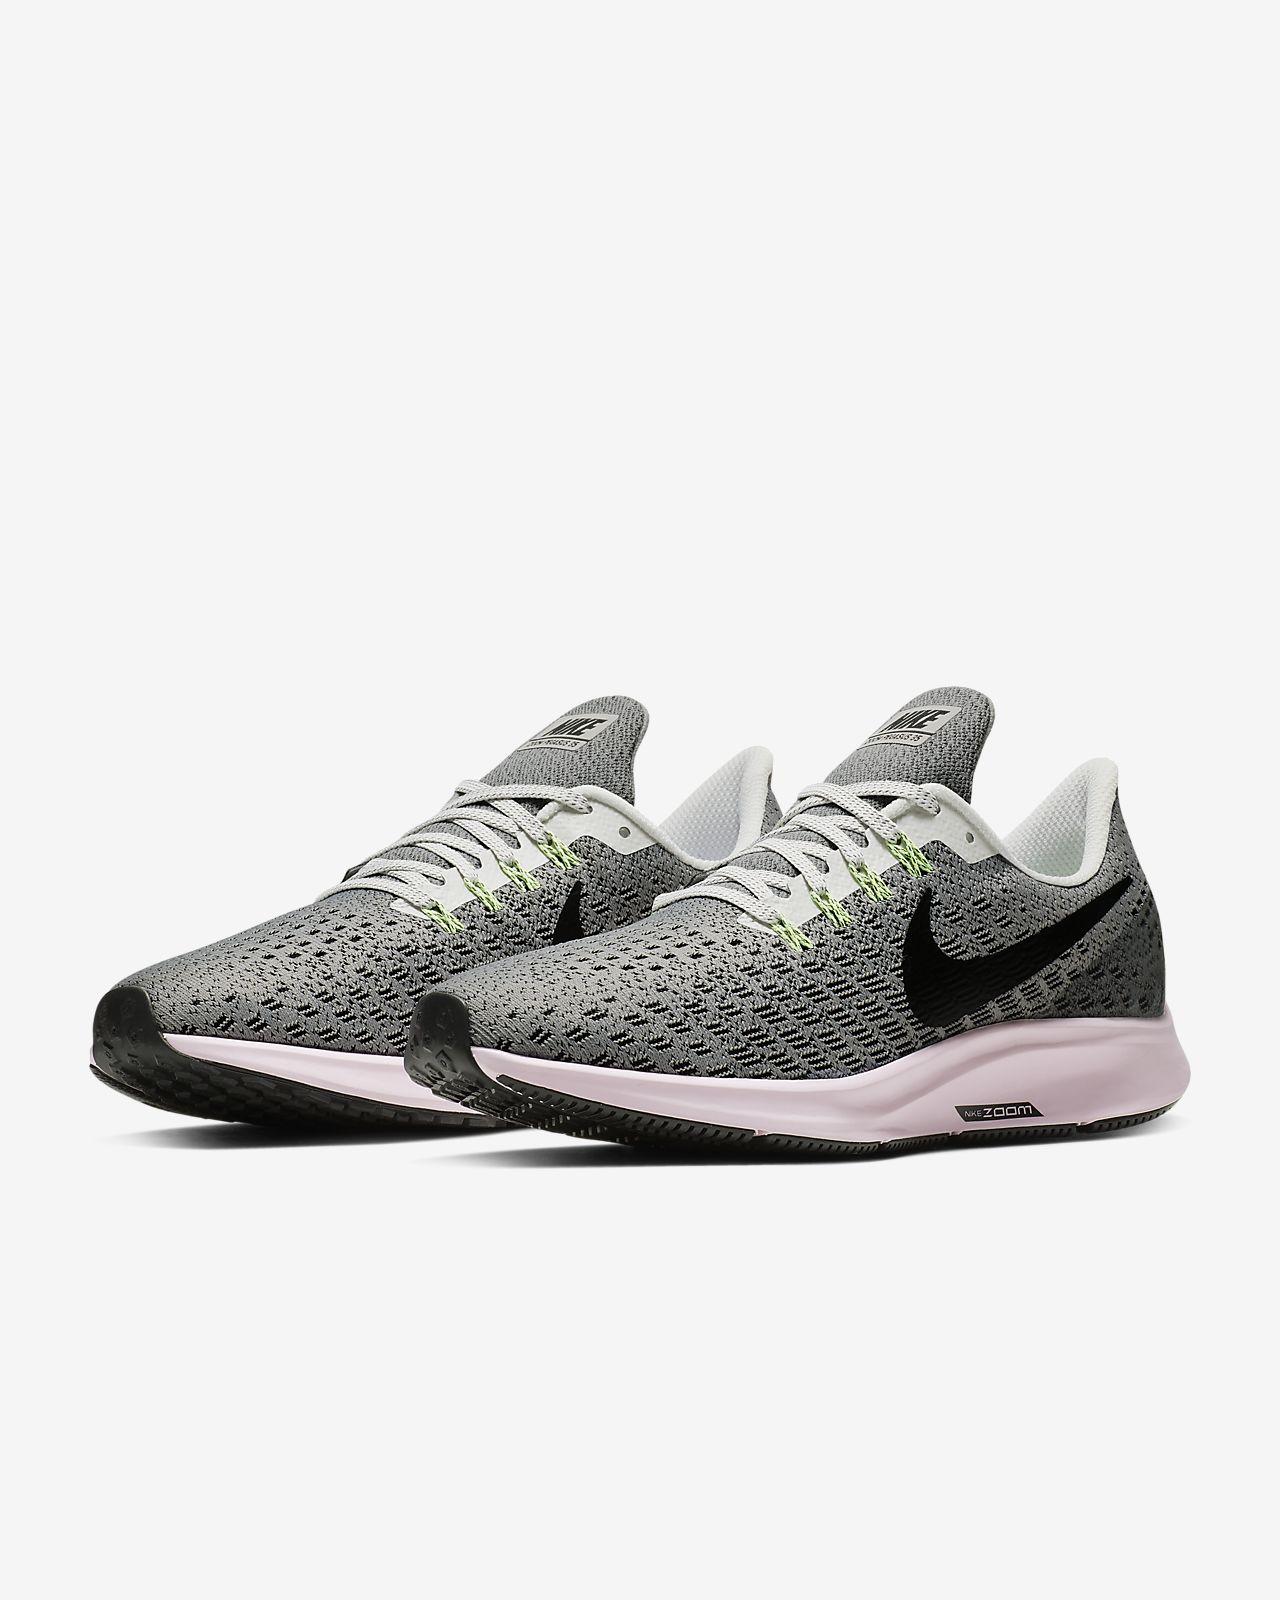 new product 60d7b 28751 ... Chaussure de running Nike Air Zoom Pegasus 35 pour Femme